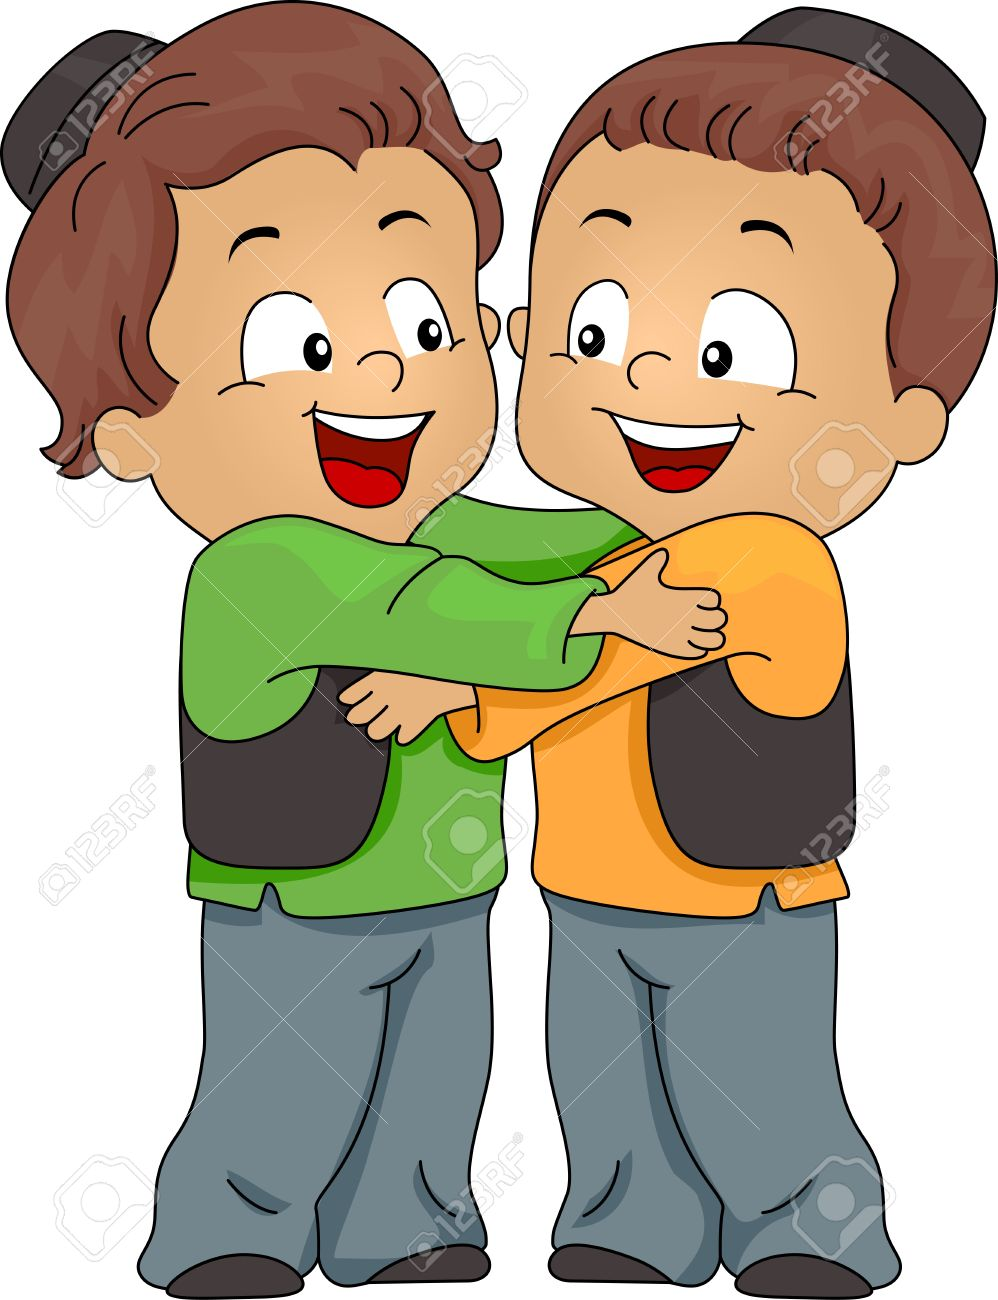 Illustration of Muslim Kids Hugging Each Other Stock Photo - 9781939